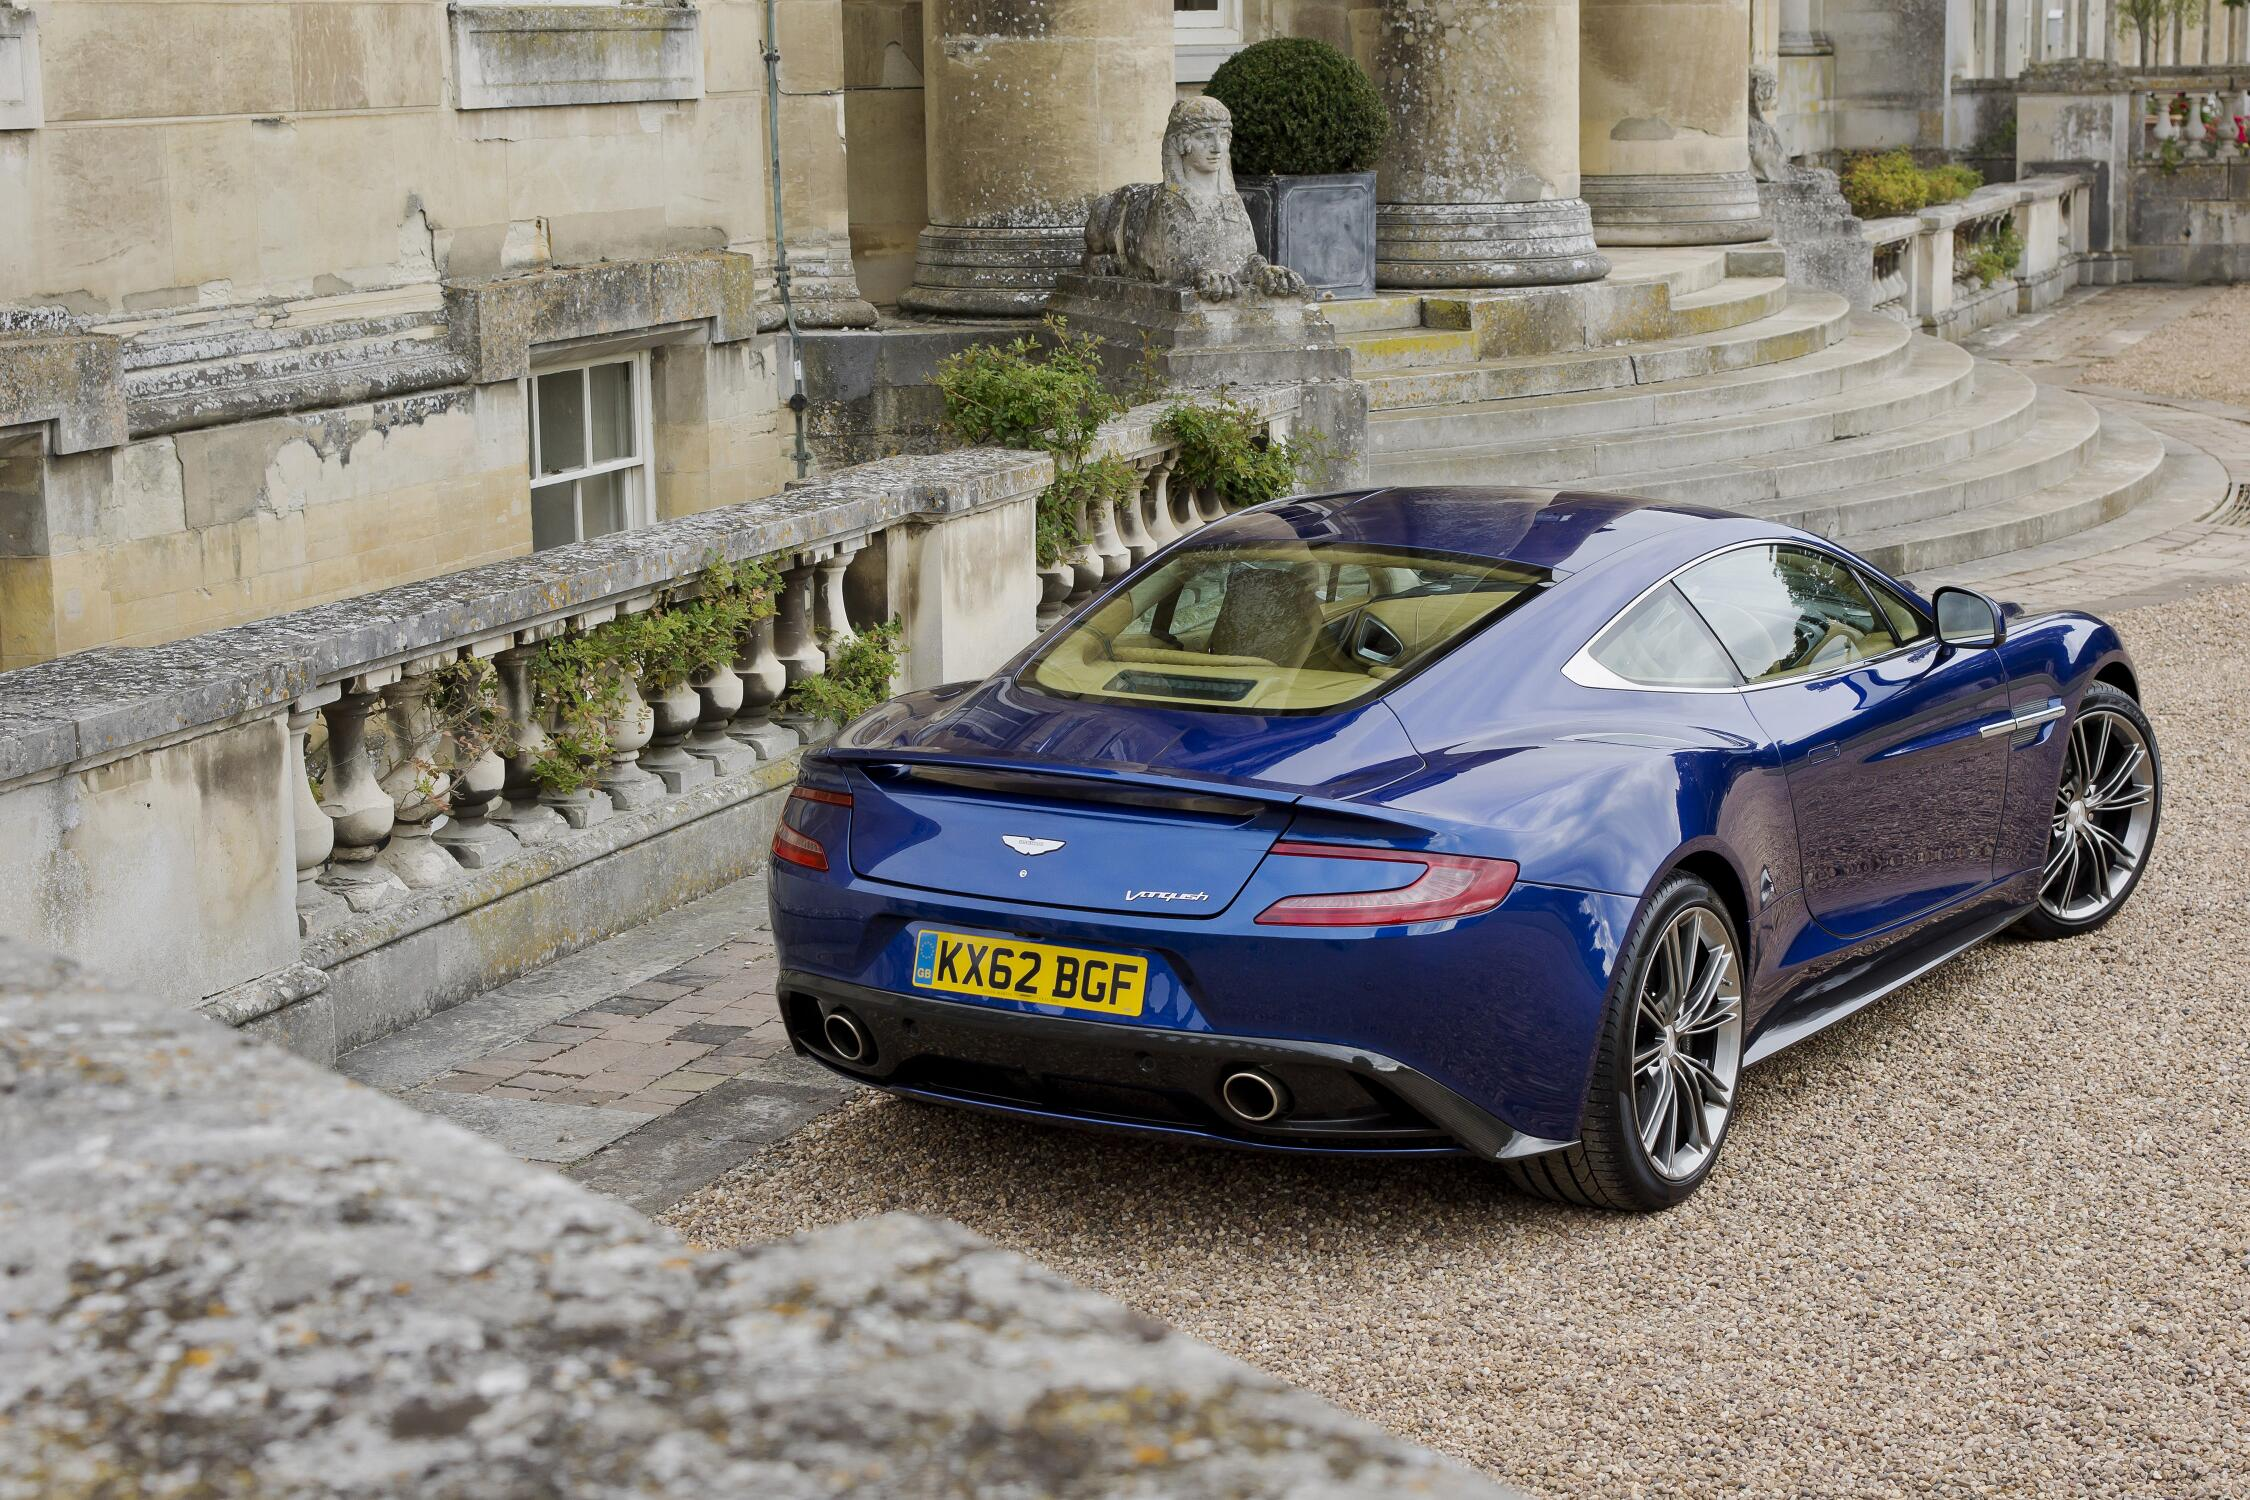 aston martin vanquish driven, tesla cash flow, jaguar small car